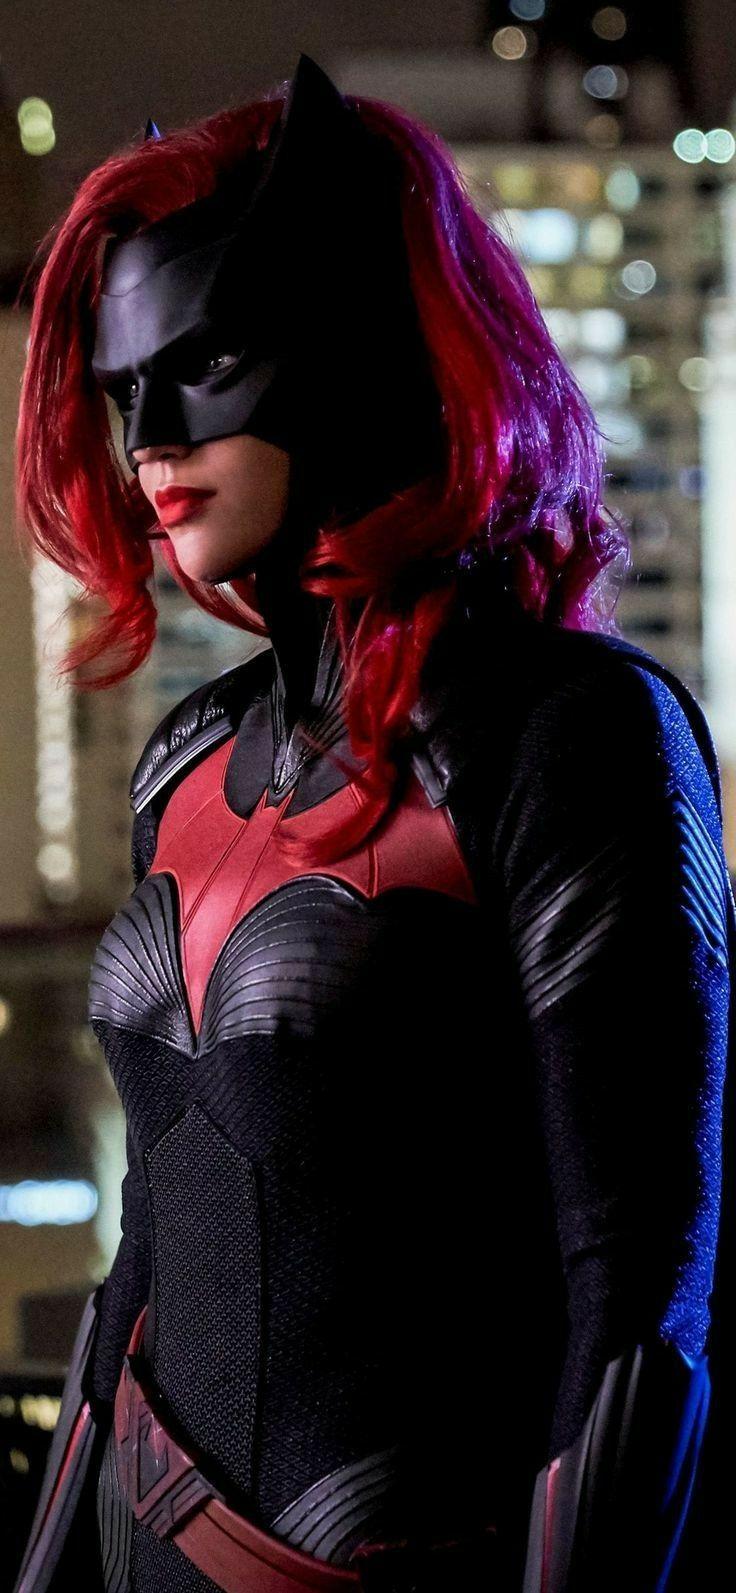 Primeiras Impressões de Batwoman | Batwoman, Rosa rubi ...